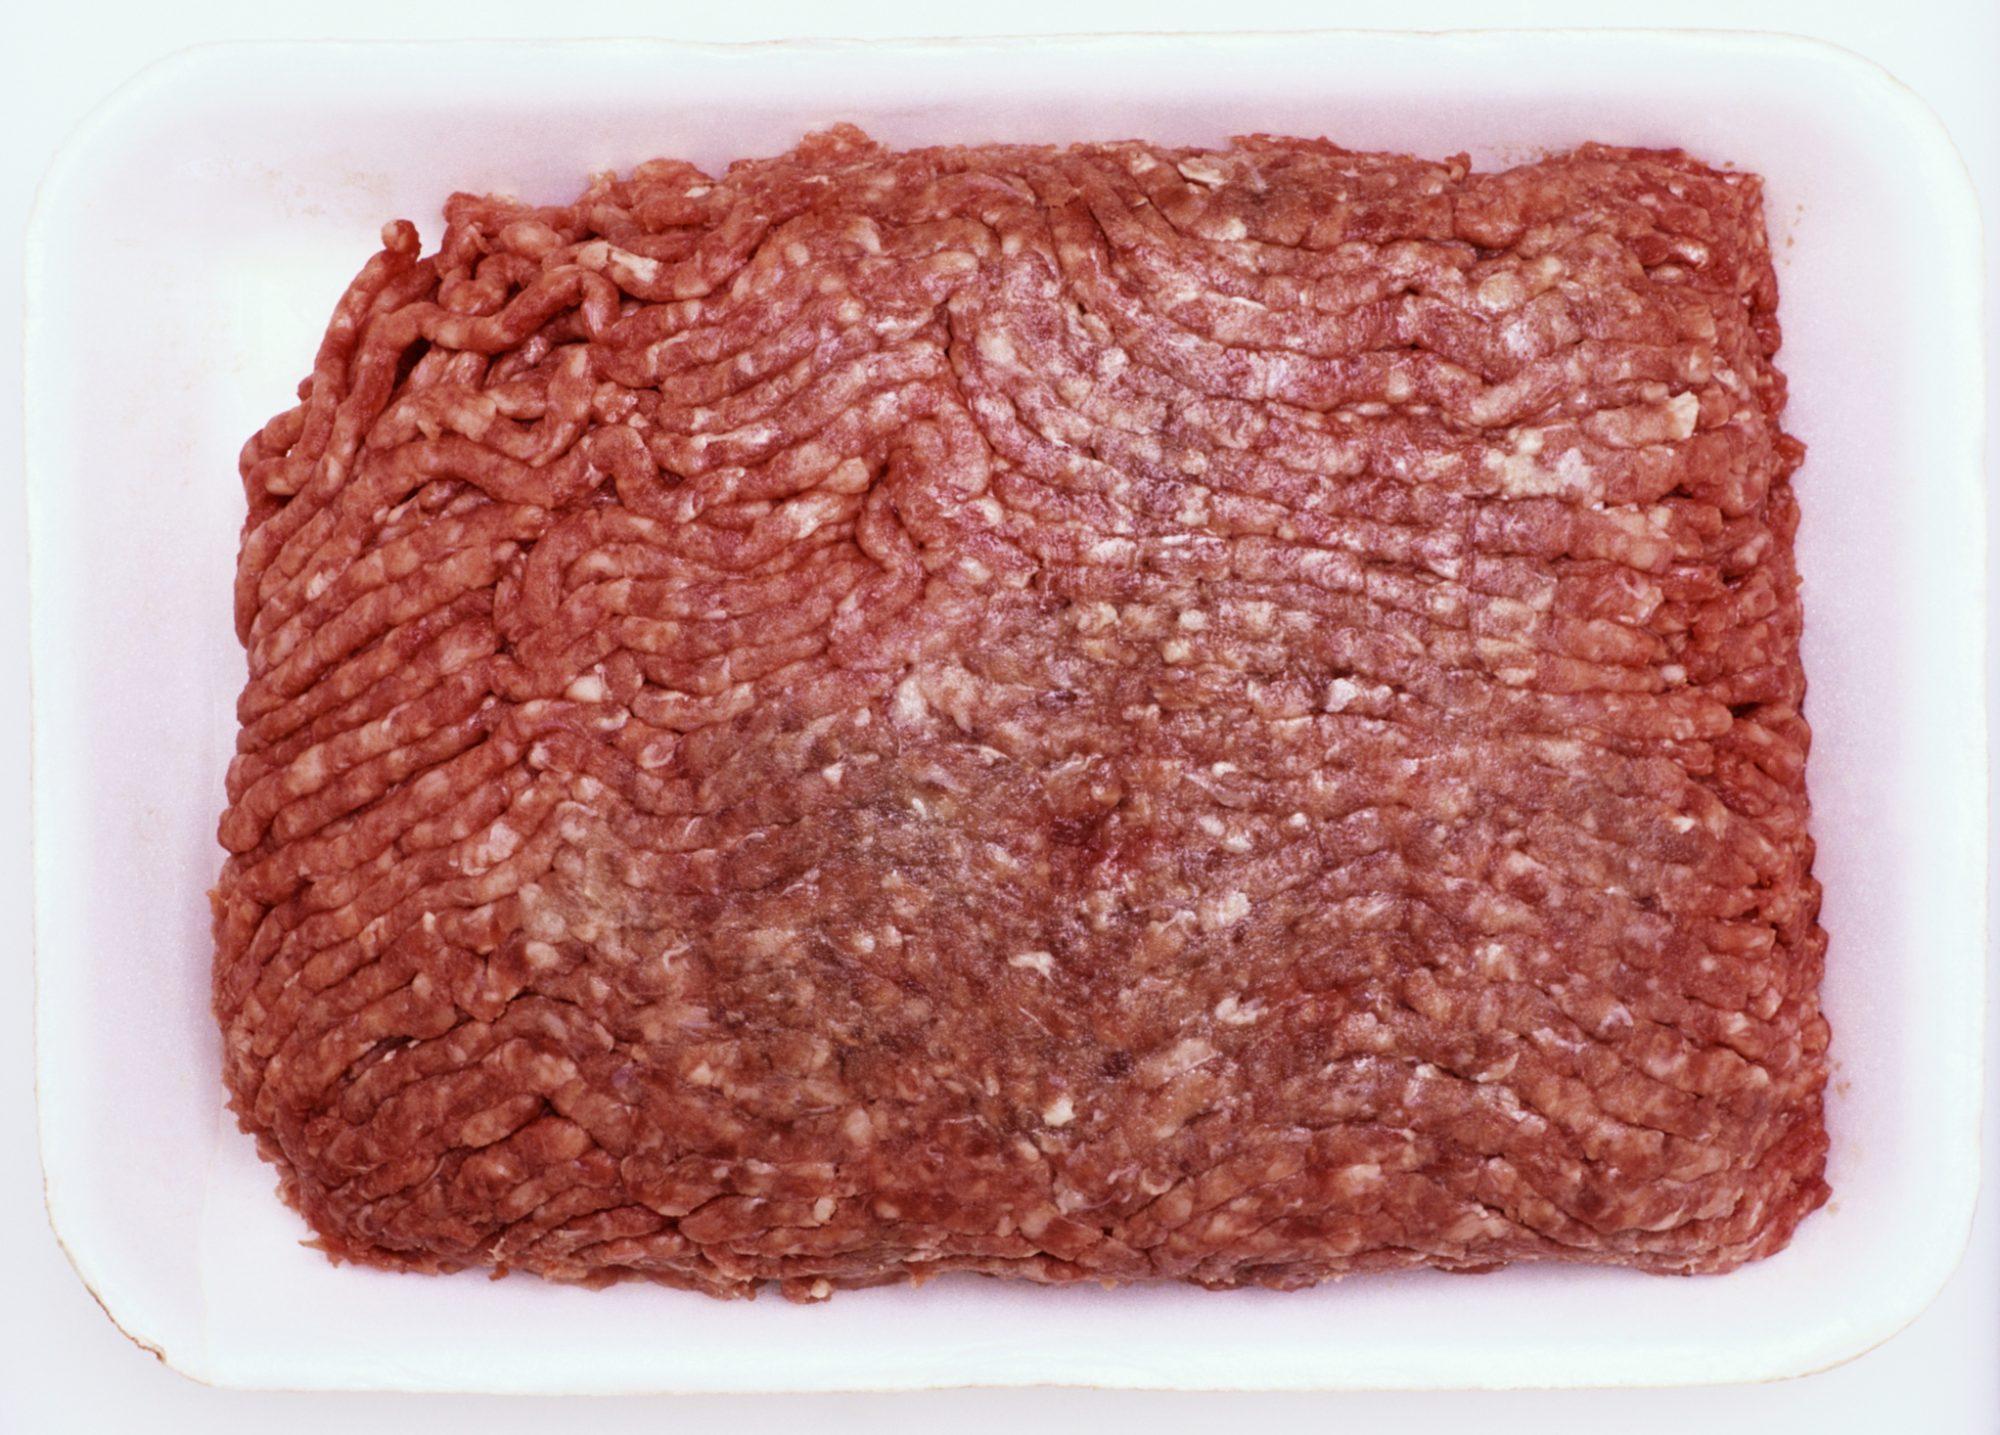 getty-ground-beef-image